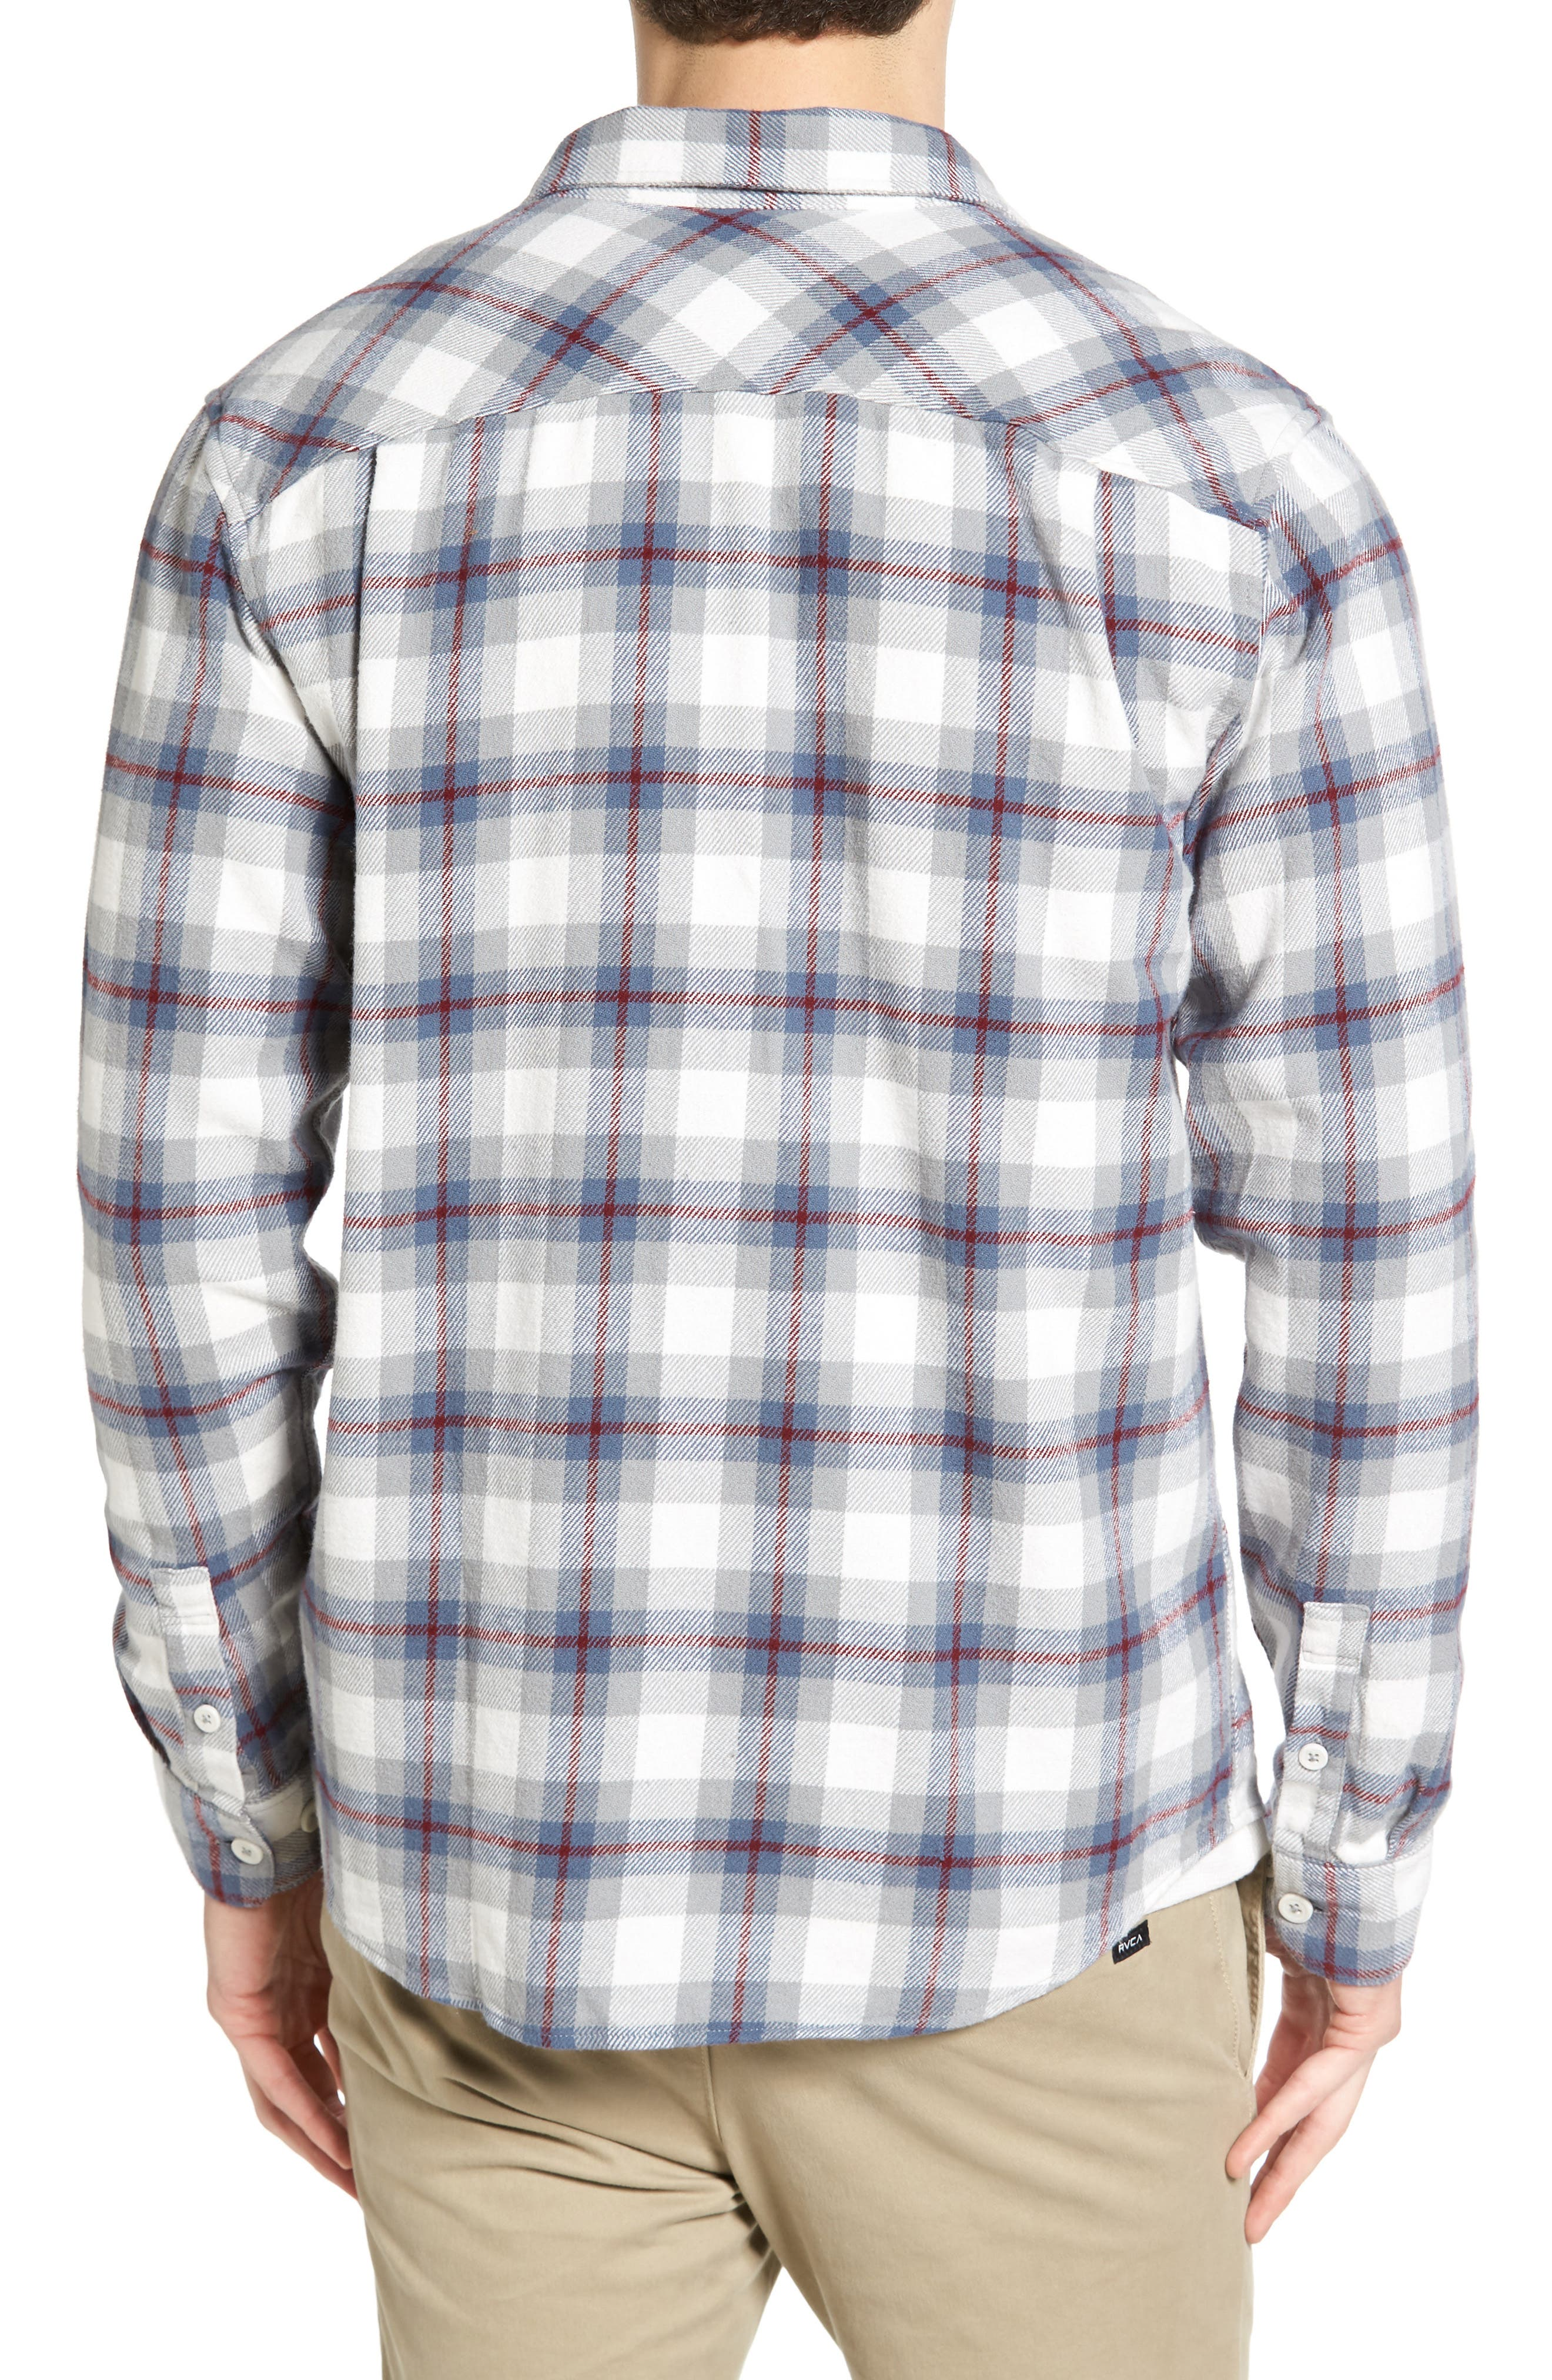 'That'll Work' Trim Fit Plaid Flannel Shirt,                             Alternate thumbnail 9, color,